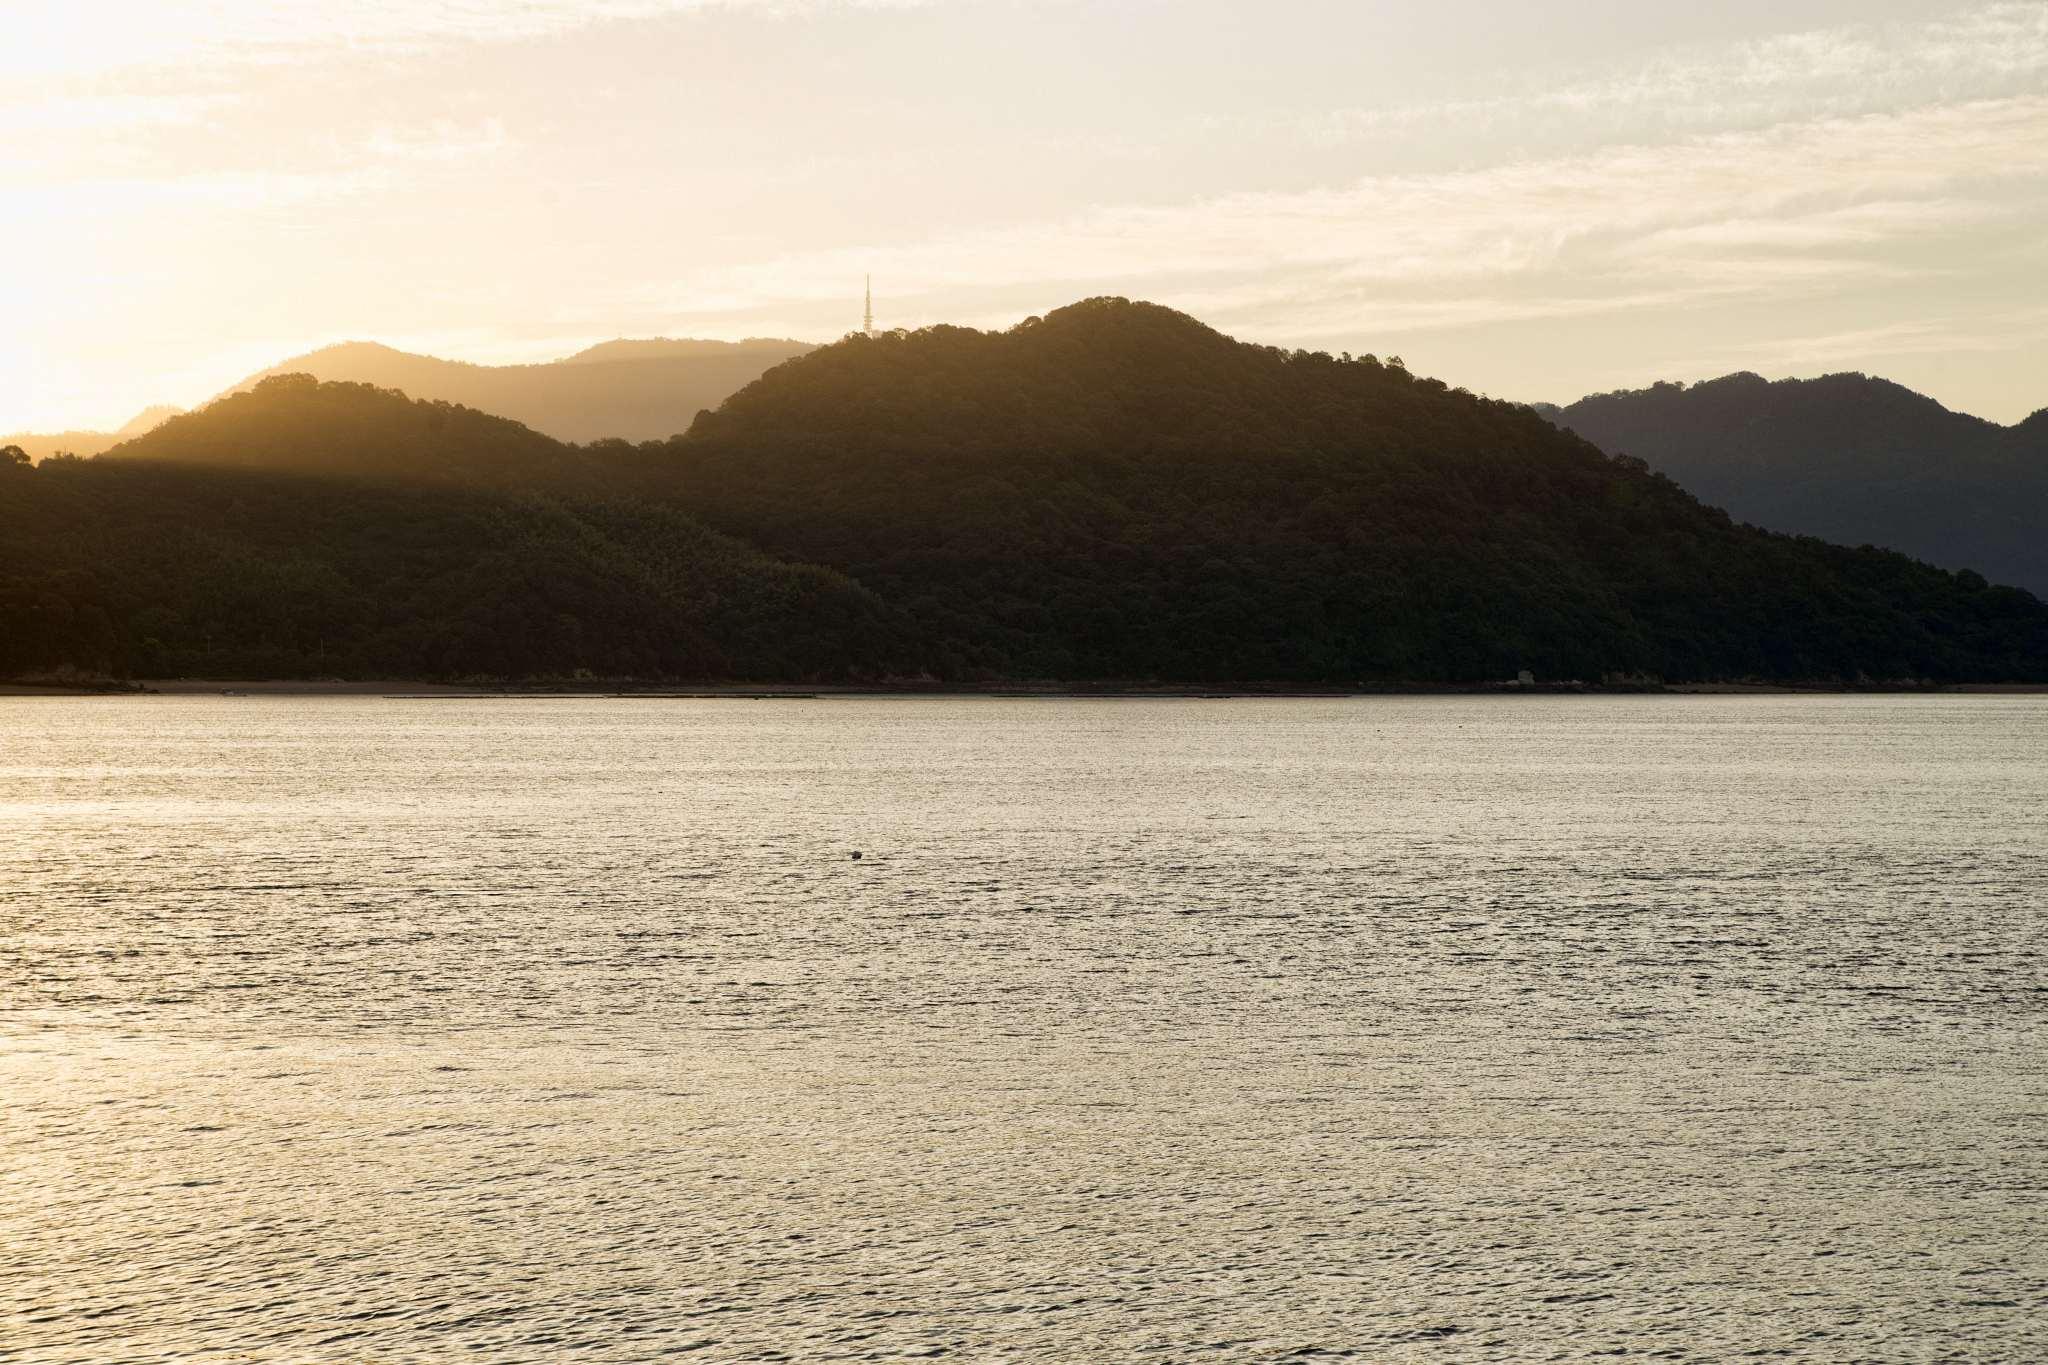 Islands off Hiroshima's coast at dawn